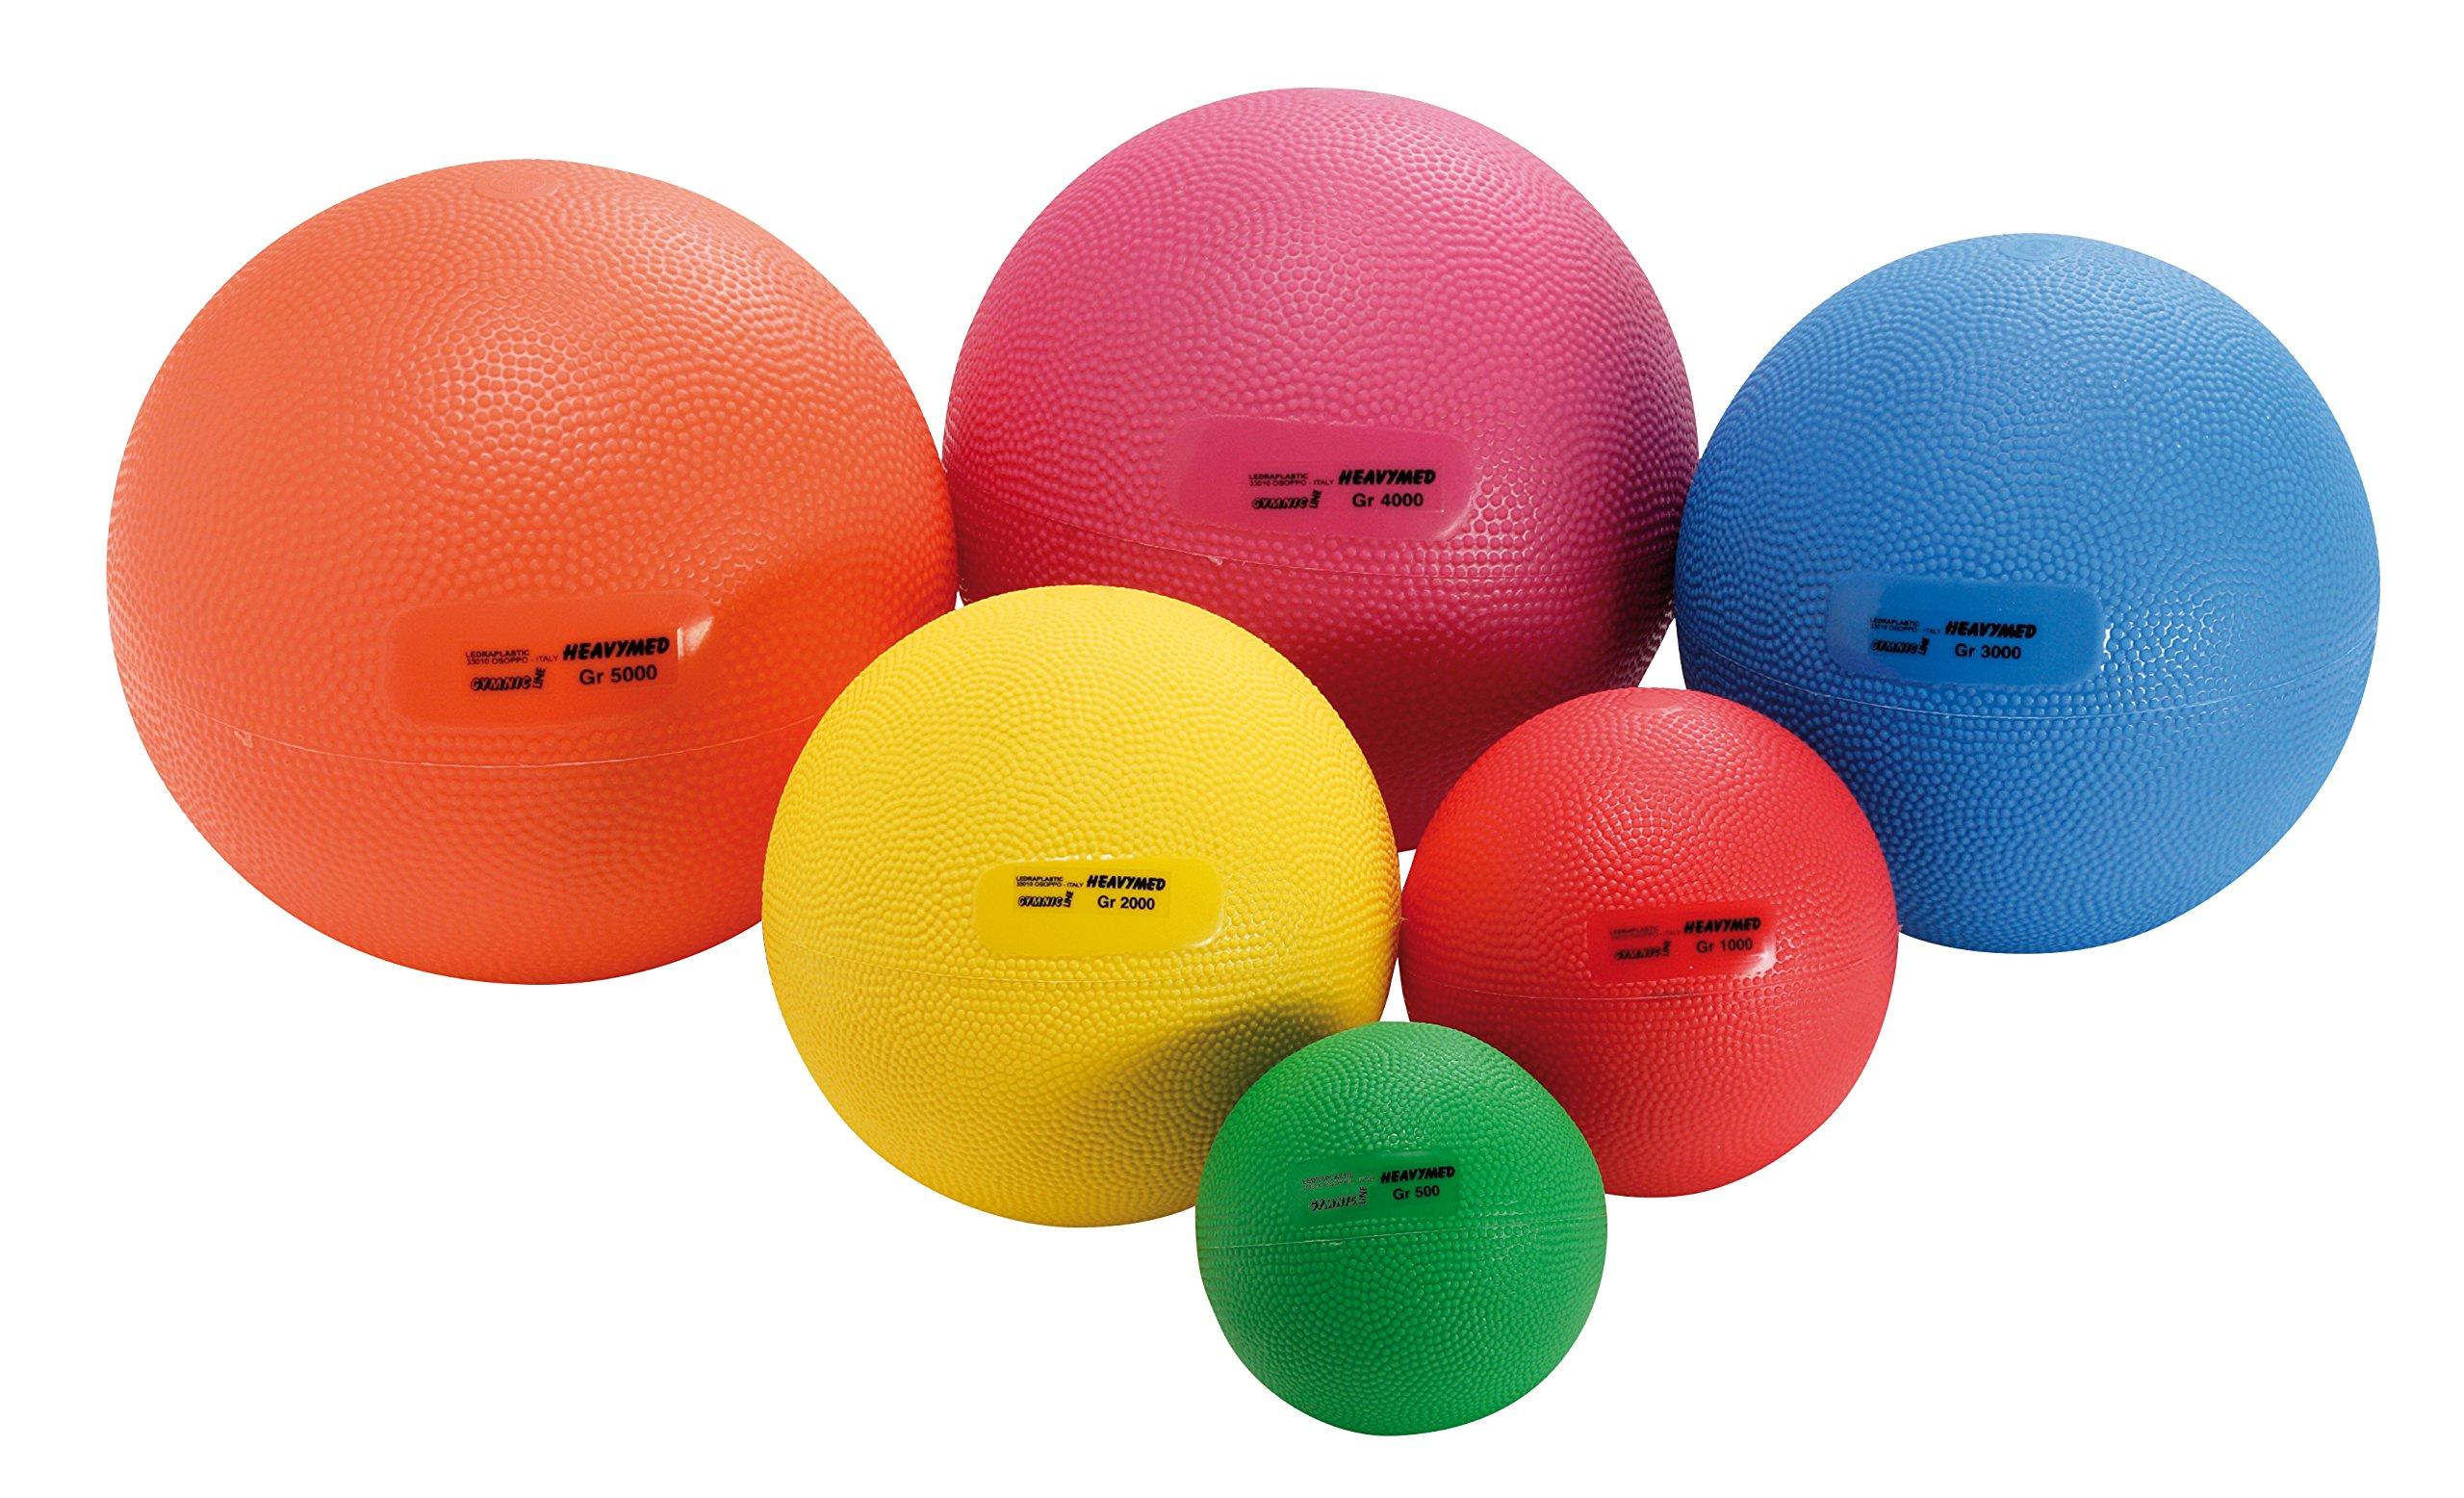 Gymnic Heavymed 2 Medicine Ball, Yellow (15 cm, 2 kg / 4.4 lbs)